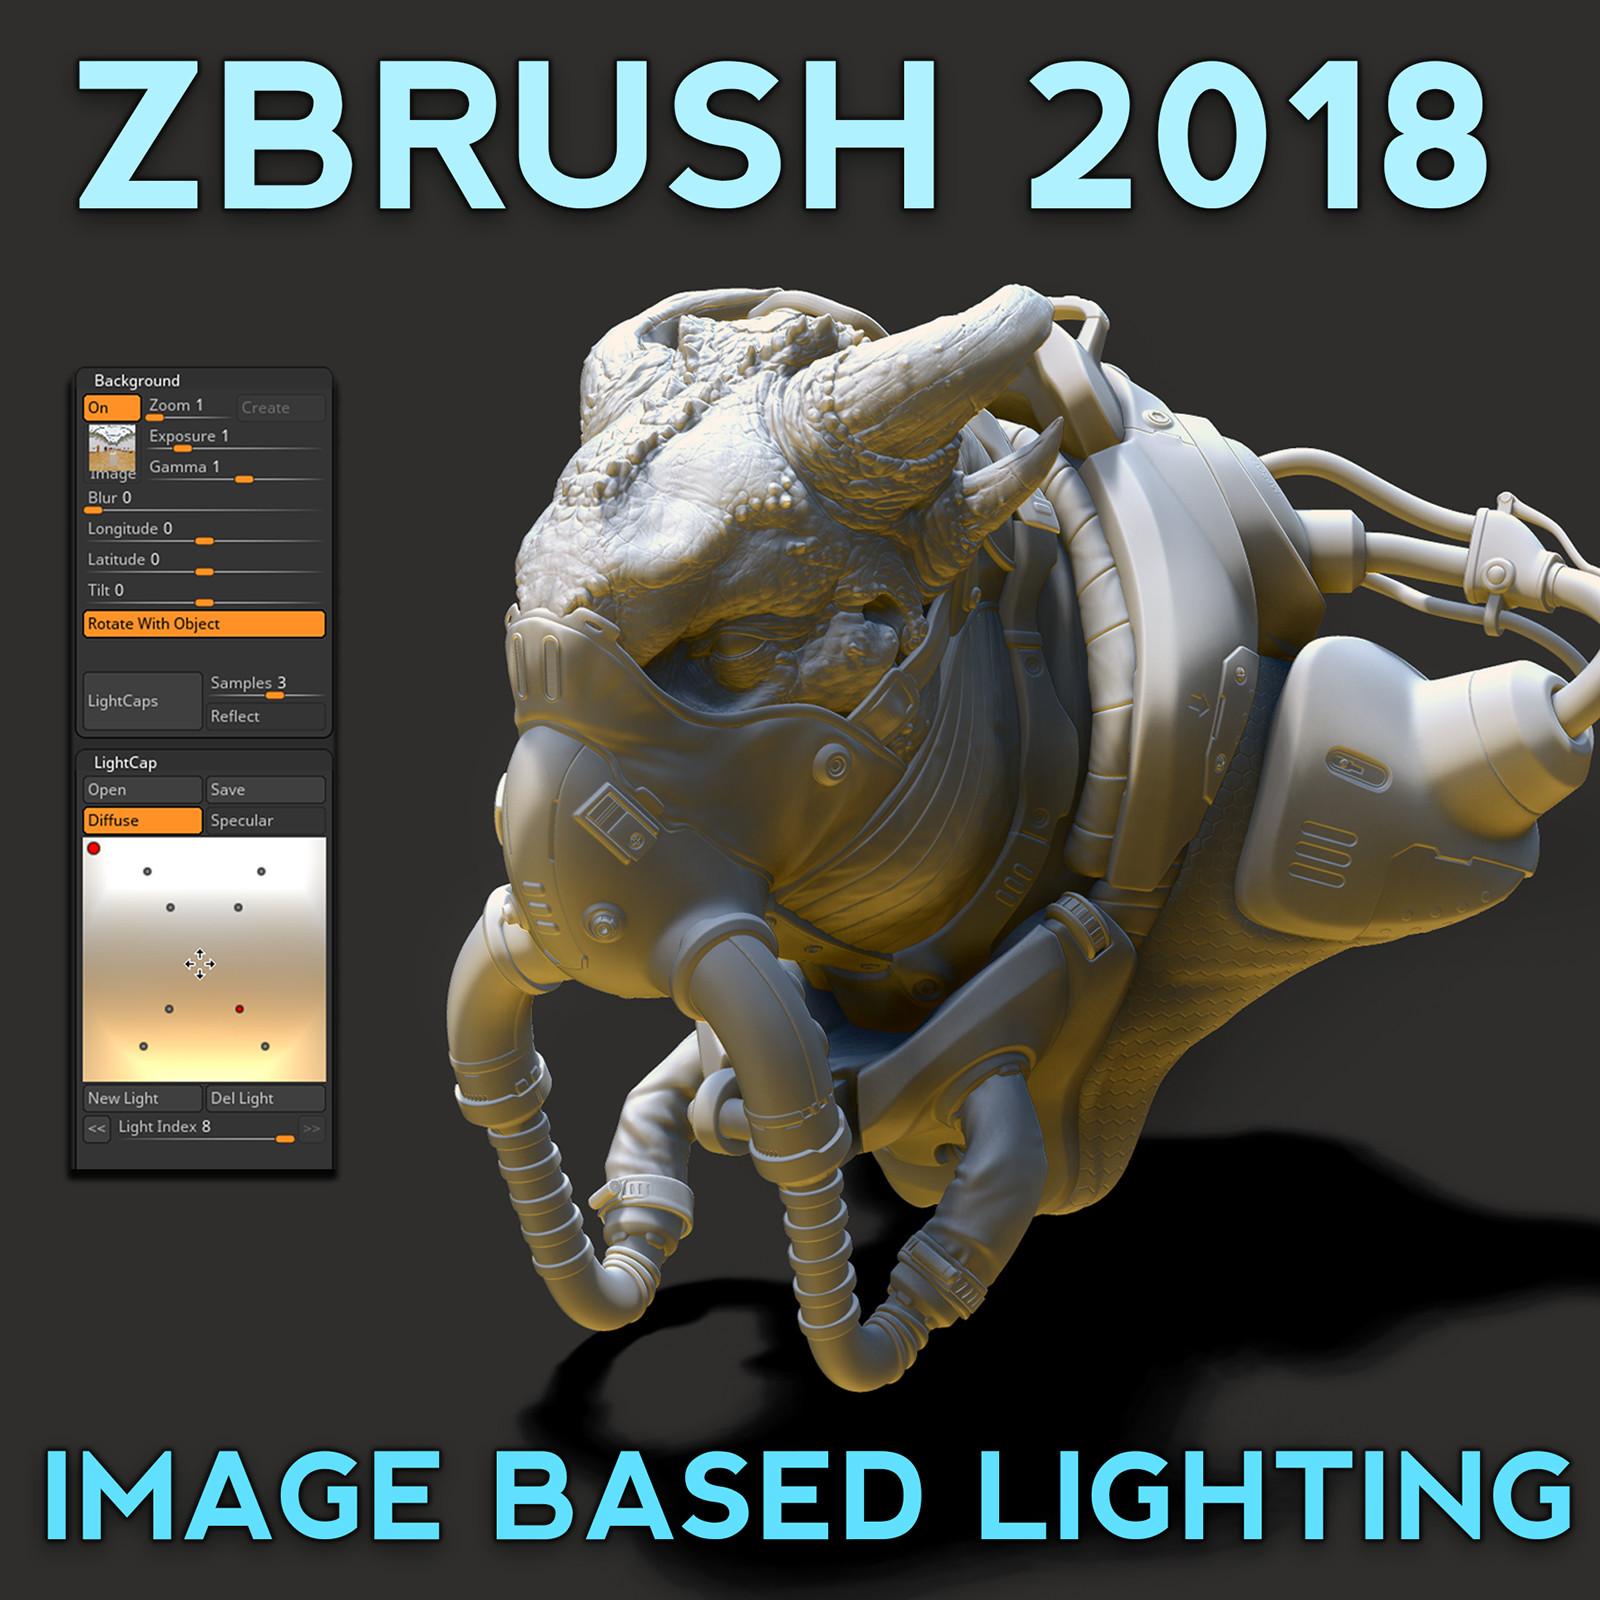 ArtStation - ZBrush Image Based Lighting, Michael Pavlovich